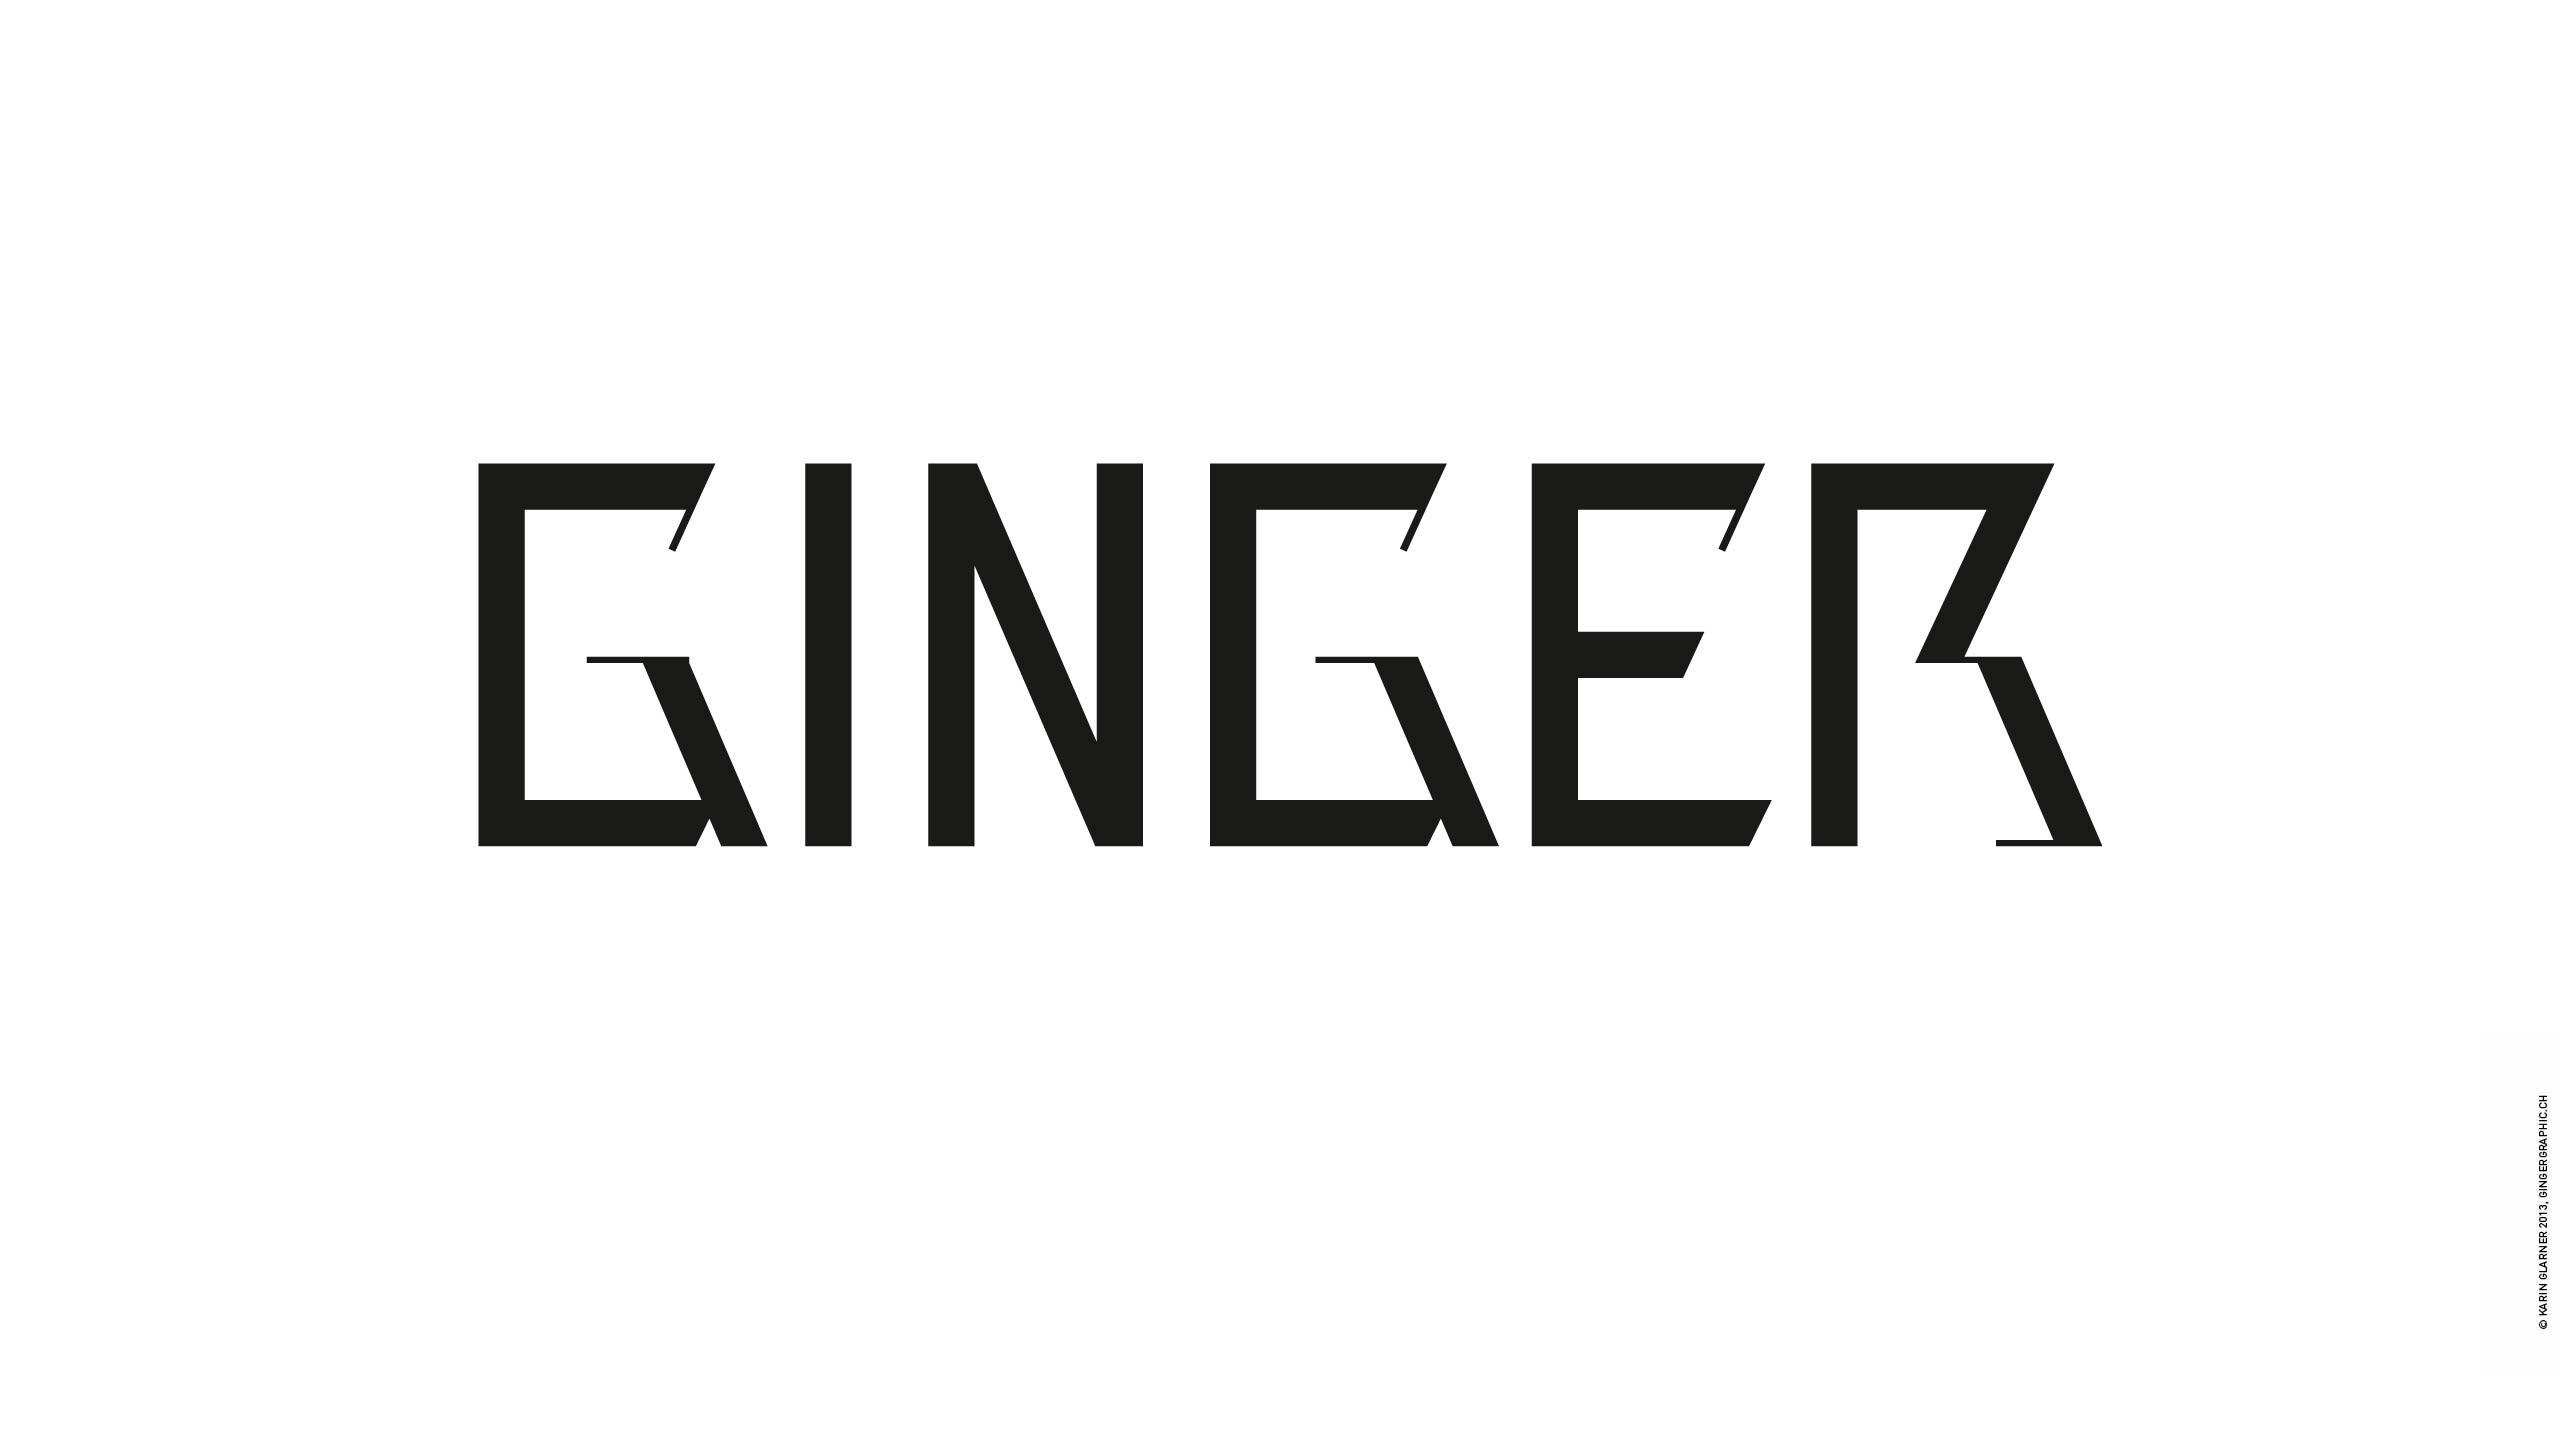 a05_typo_gingergraphic_2560x1440x600dpi